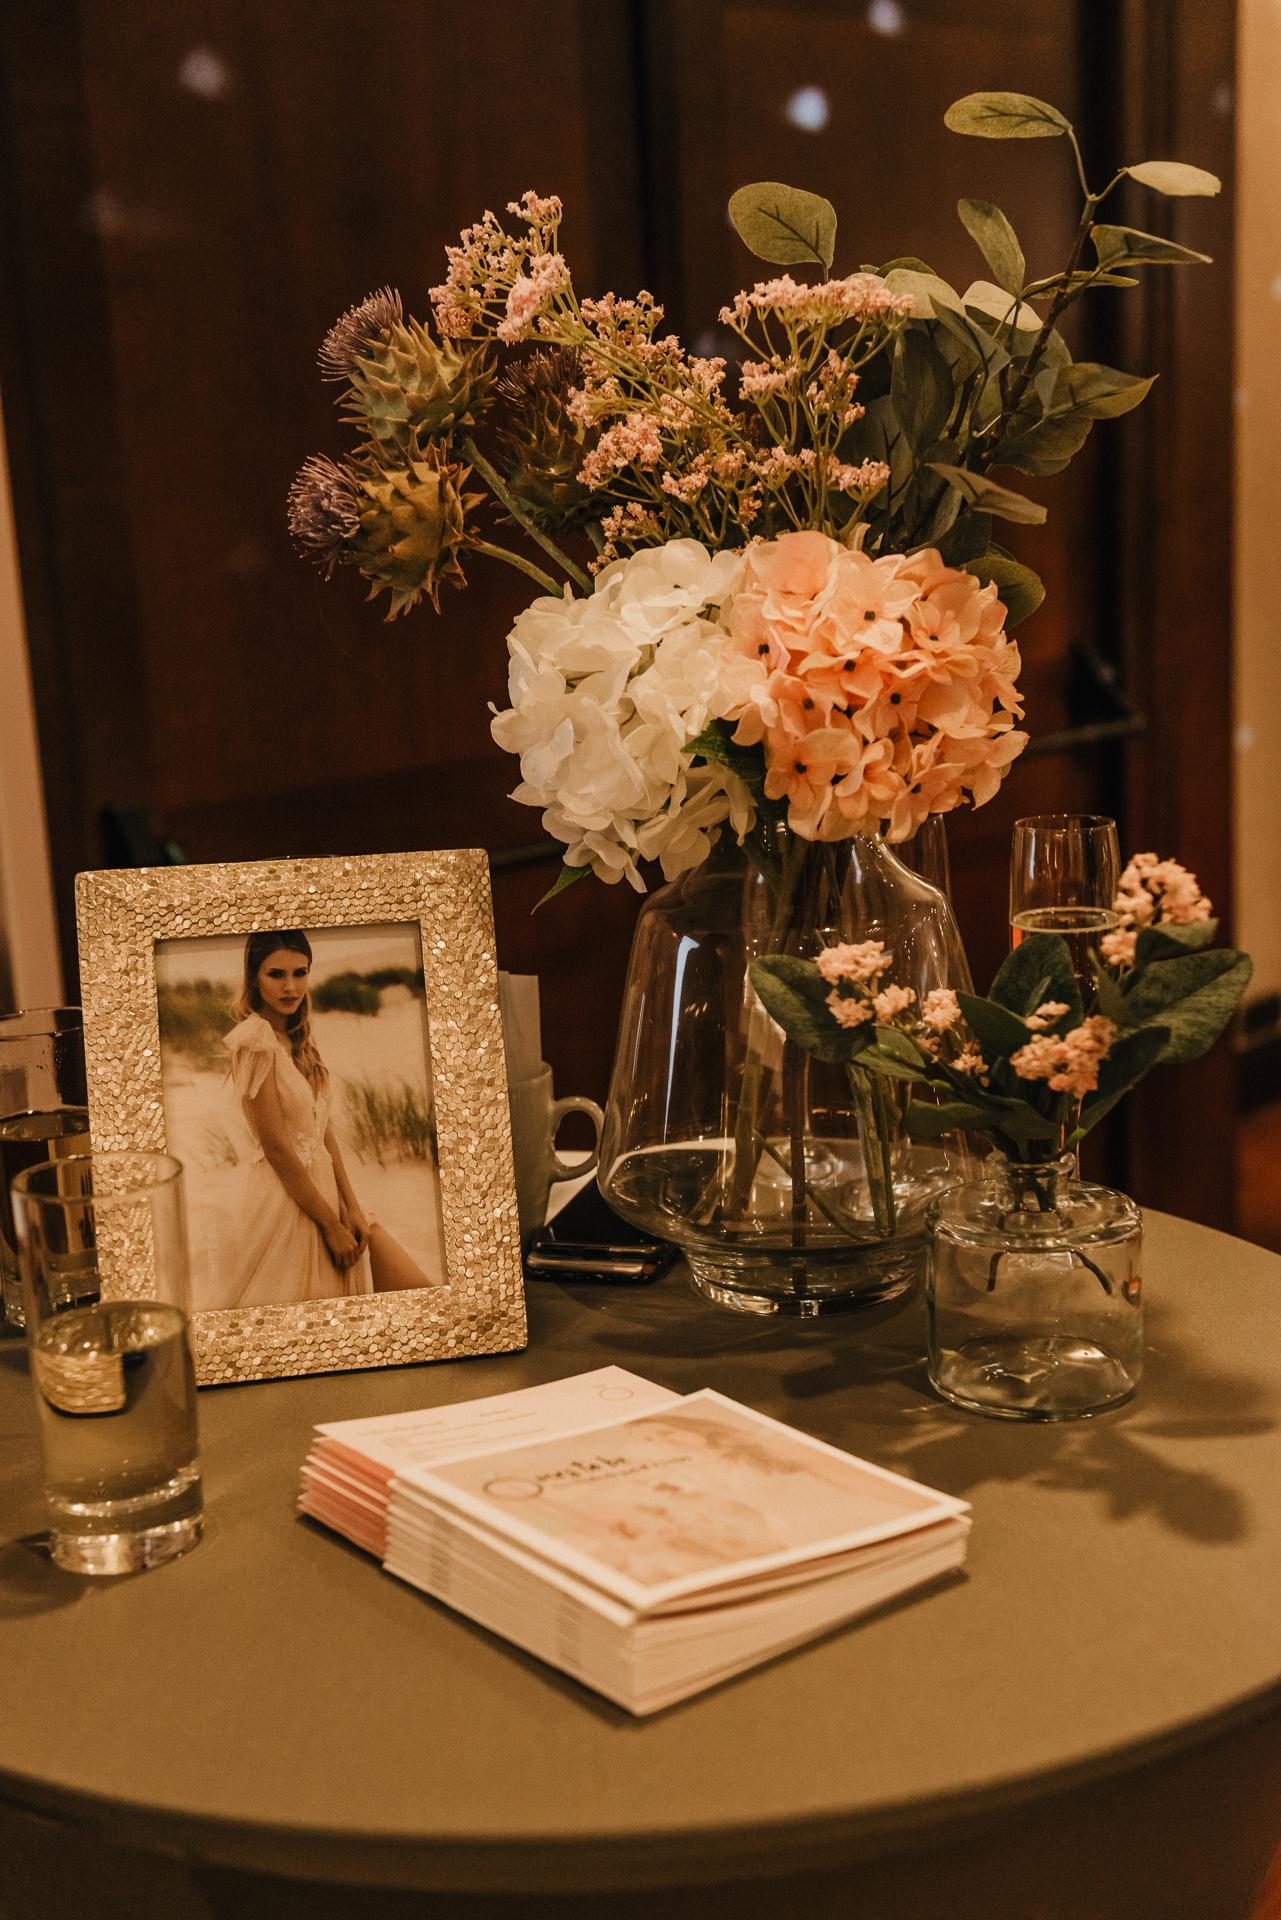 Zweinander-LeonoreHerzog-WeddingMarket-OnTour20191110-9269